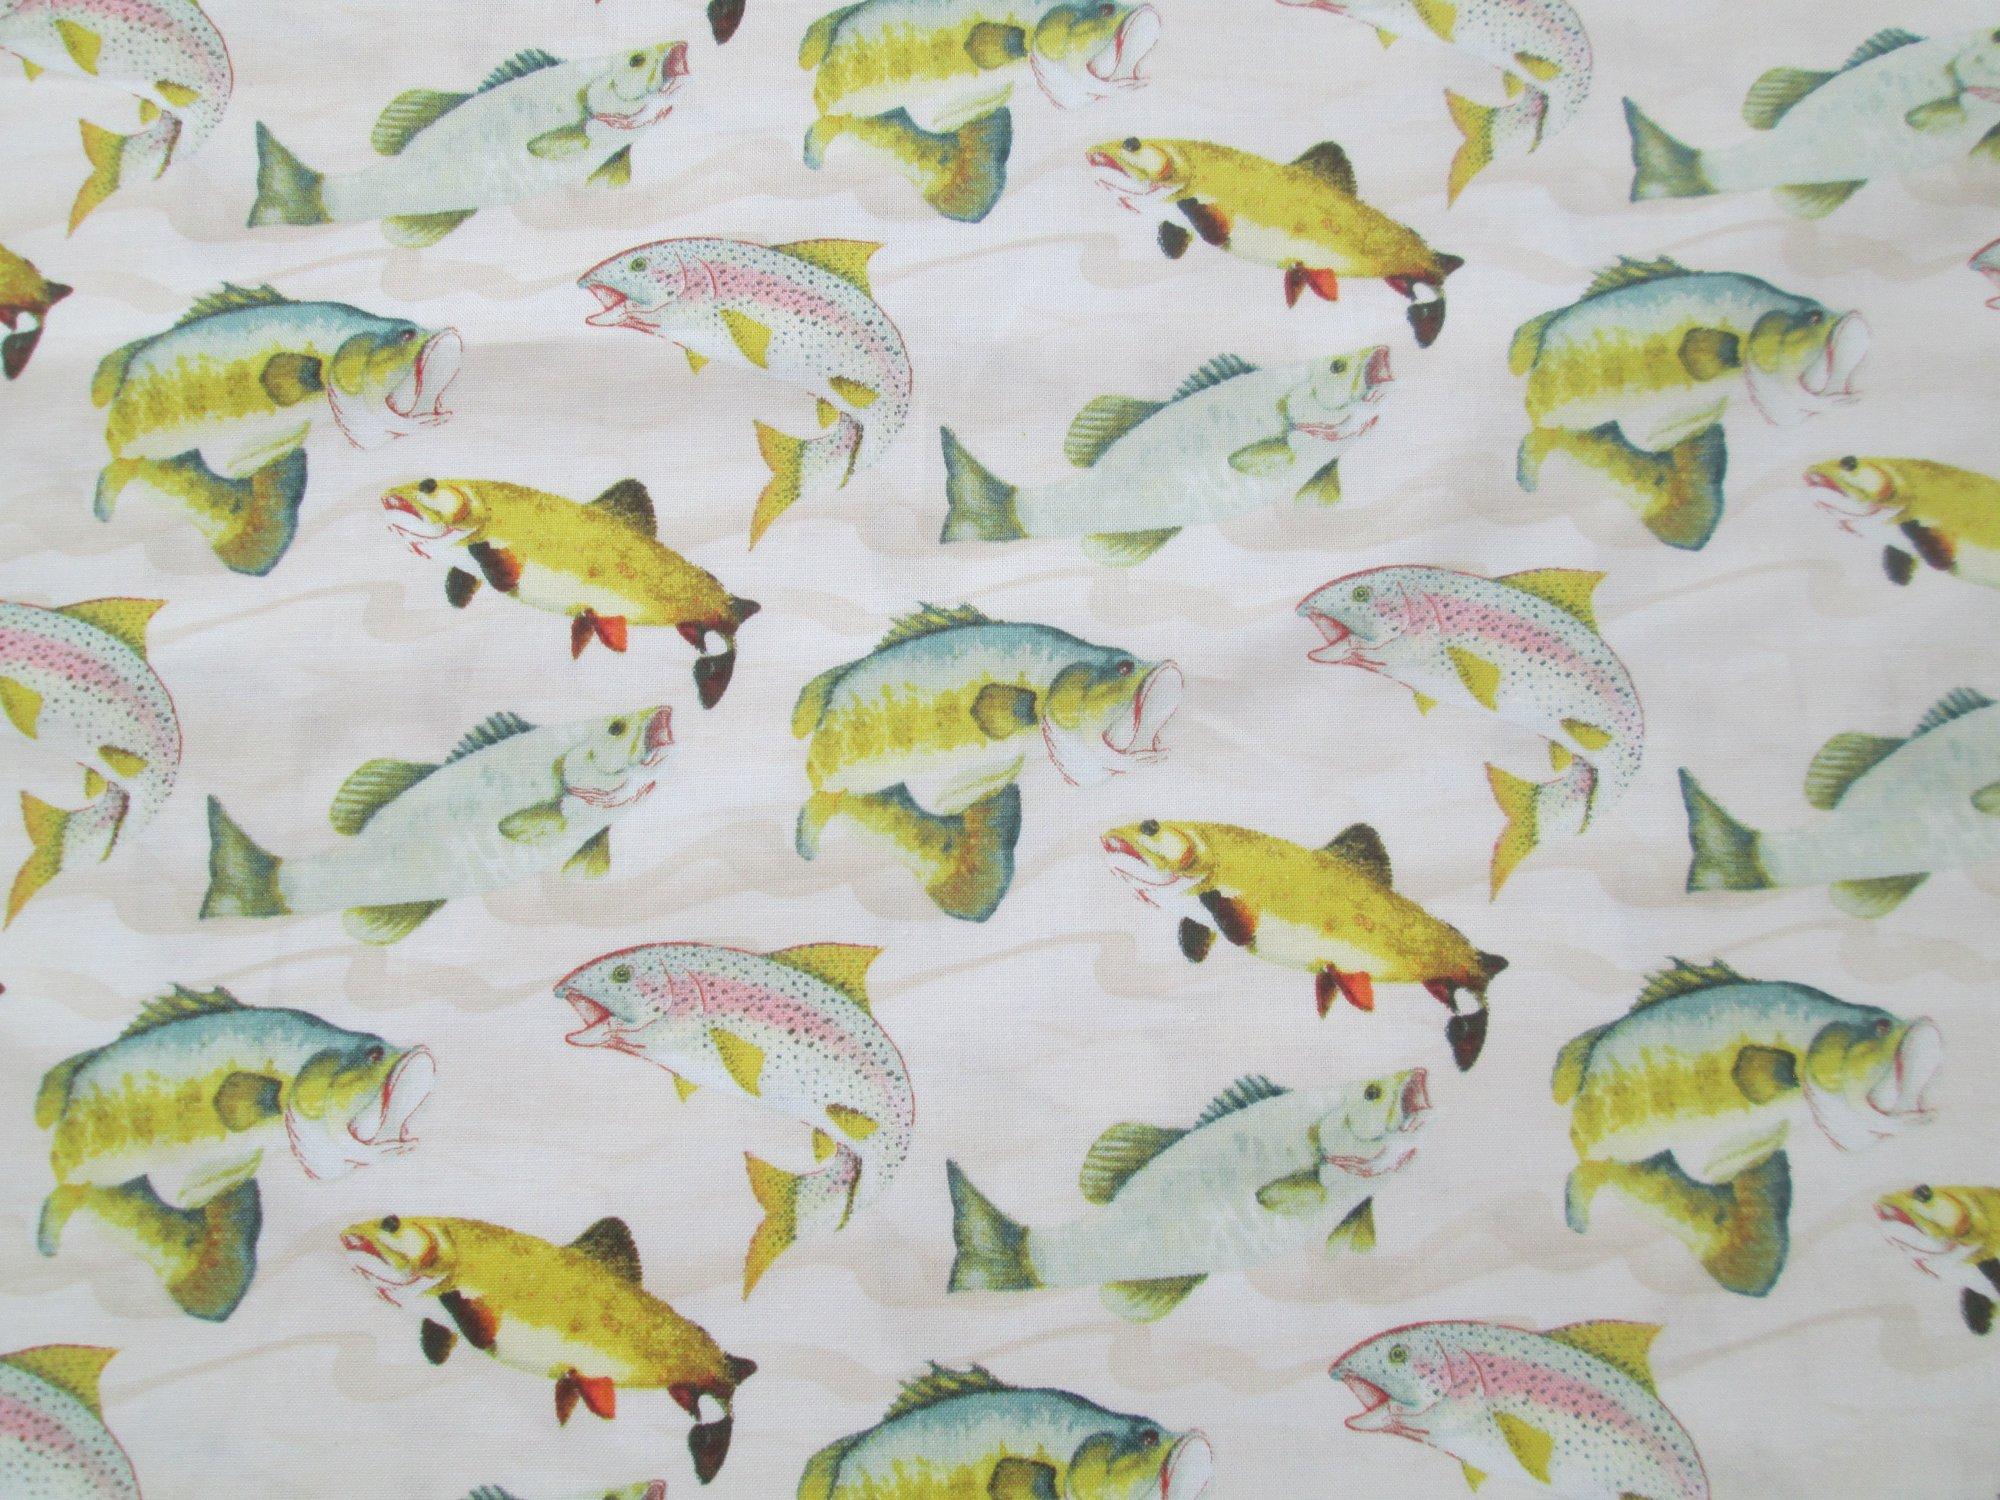 Windham Gone Fishin 50381-4 Fish on Cream Trout, Bass, Walleye